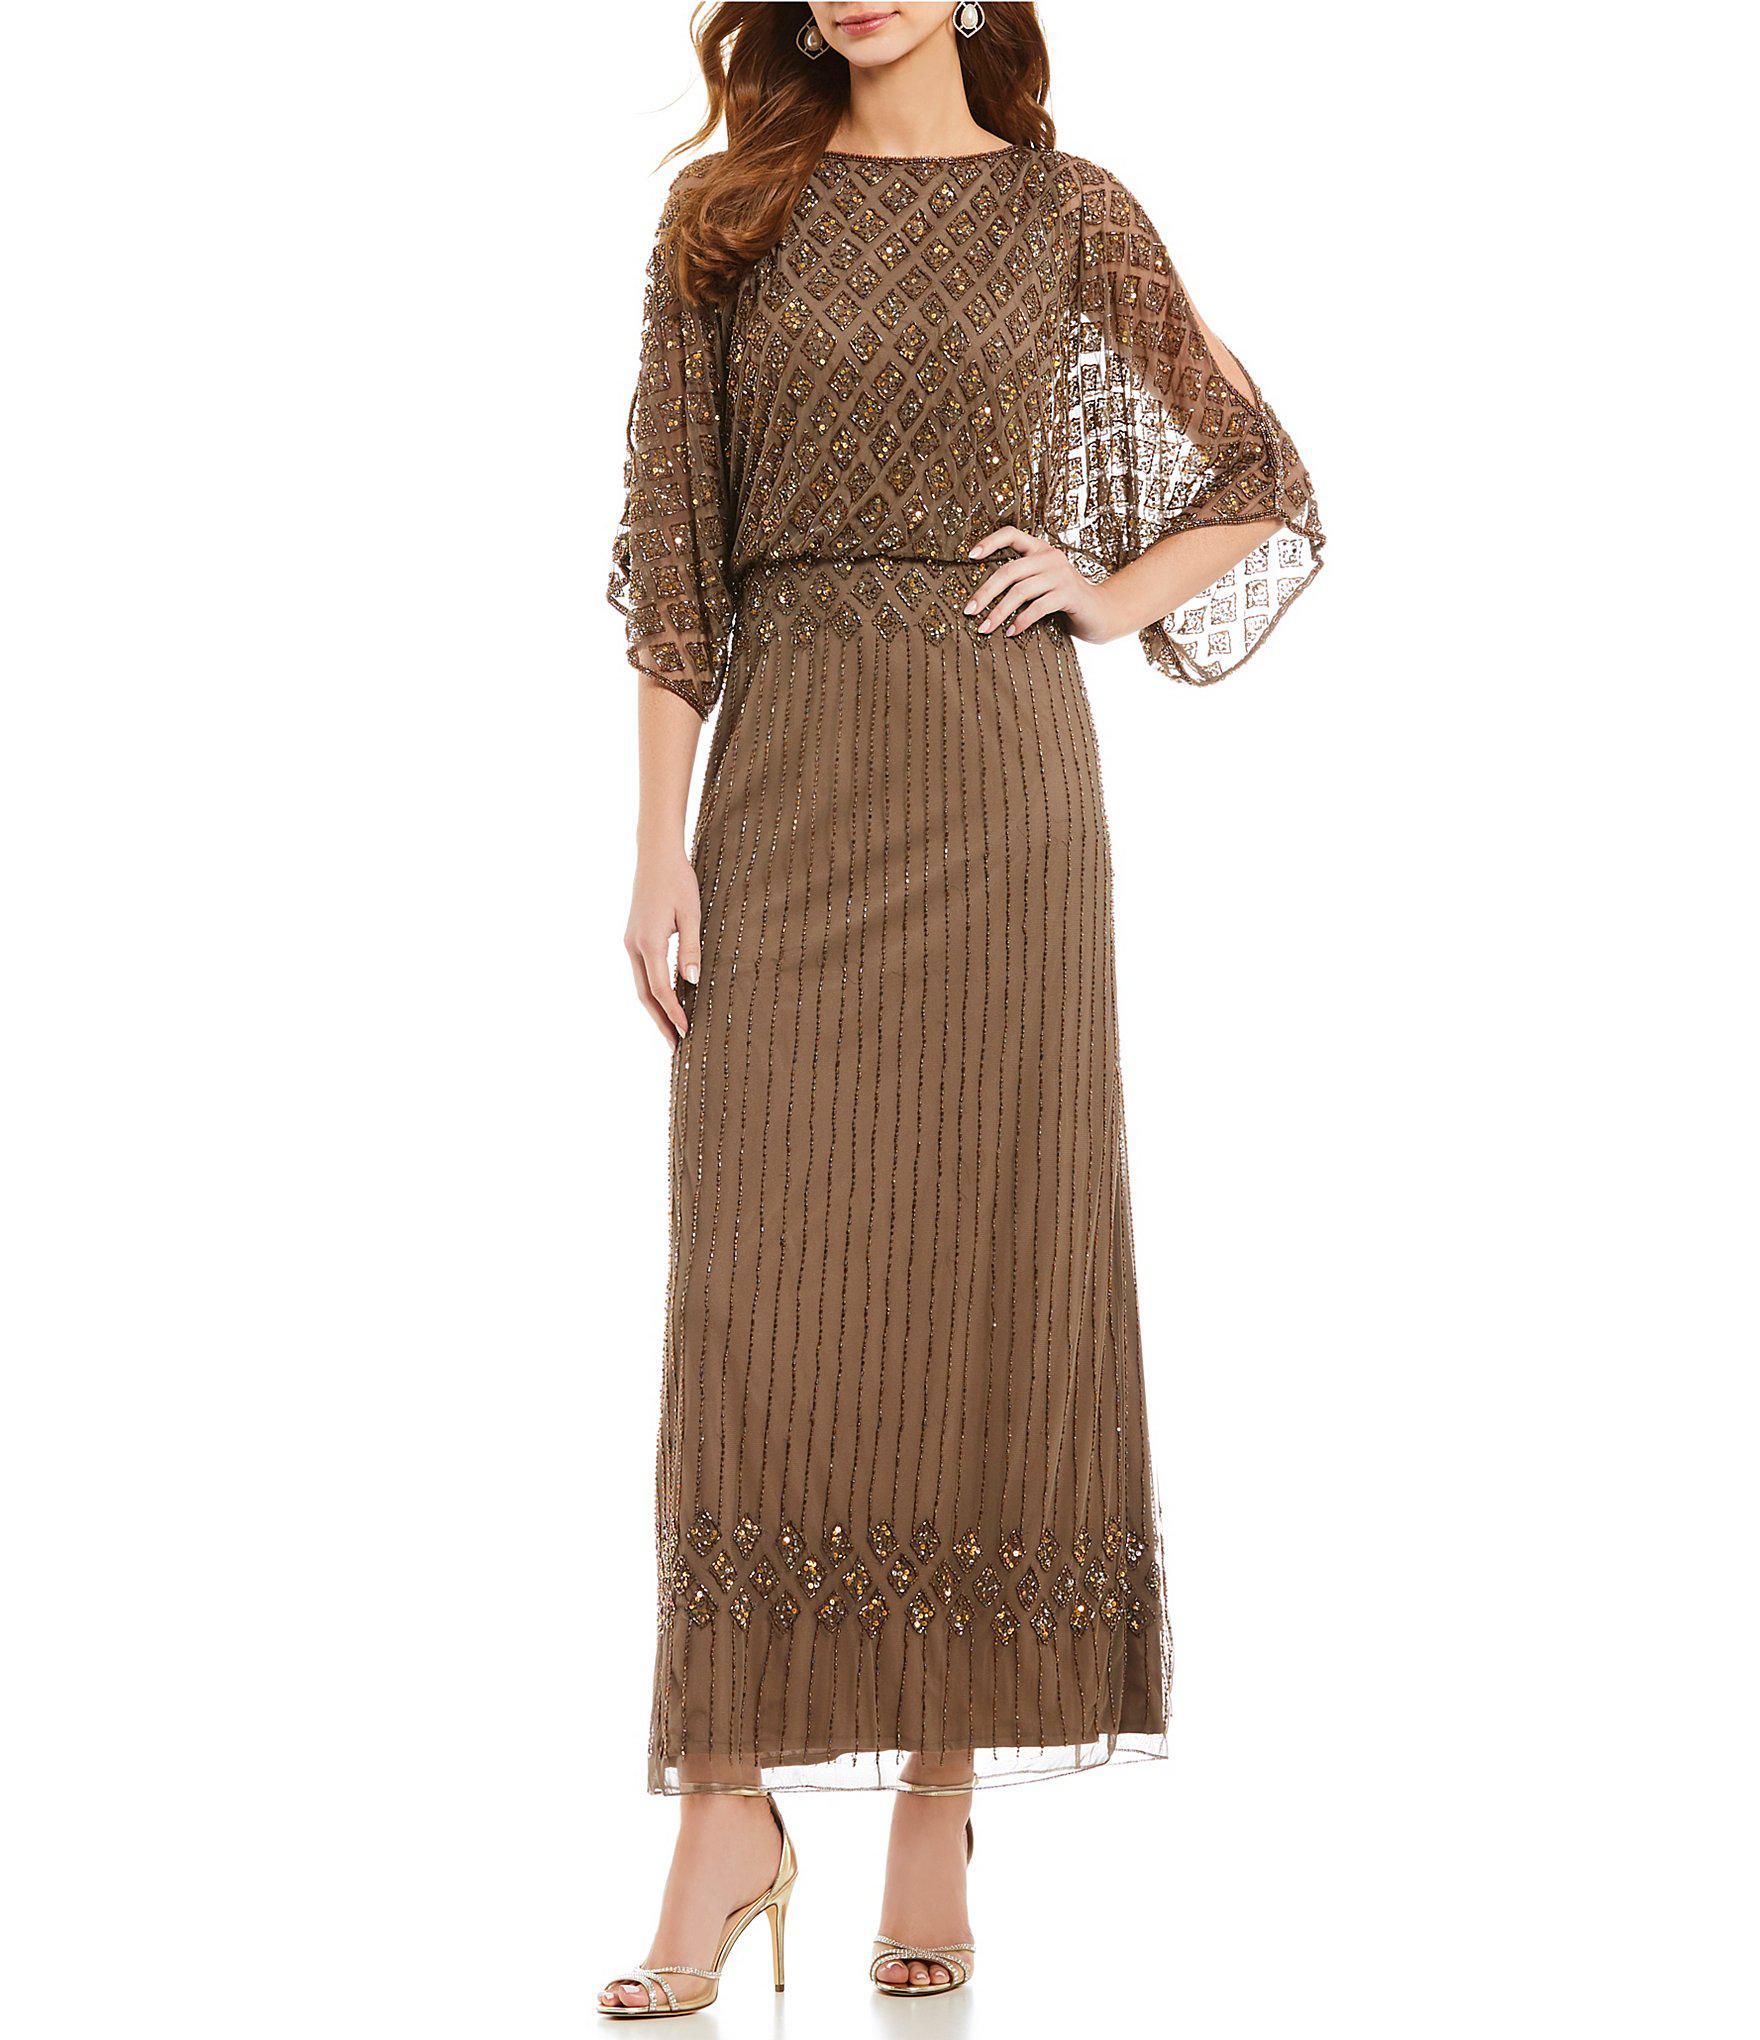 5db5876d81c5 Pisarro Nights Beaded Bodice Blouson Gown in Brown - Lyst